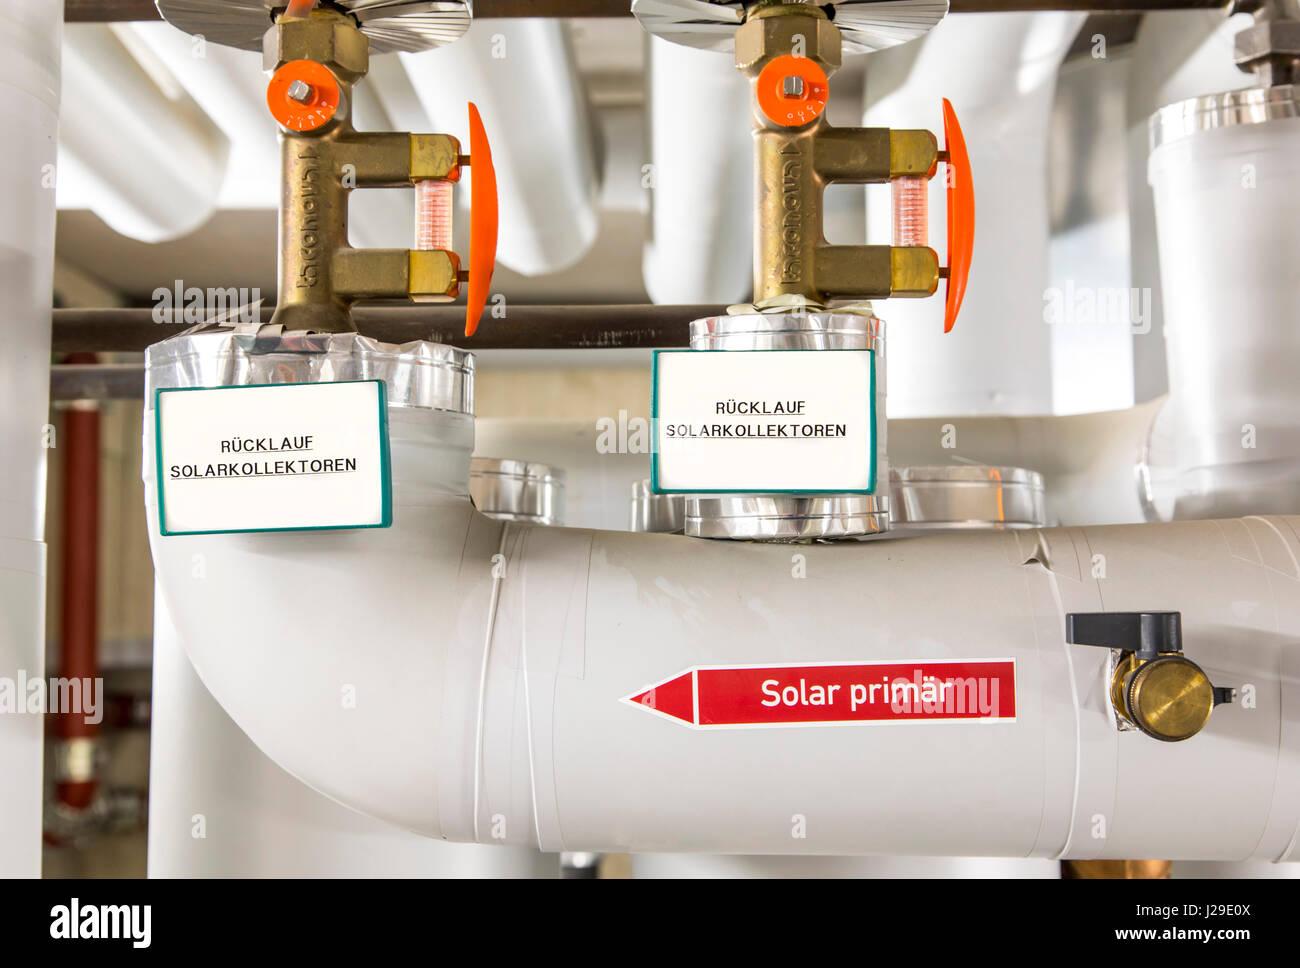 Hot Water Boiler Stock Photos & Hot Water Boiler Stock Images - Alamy